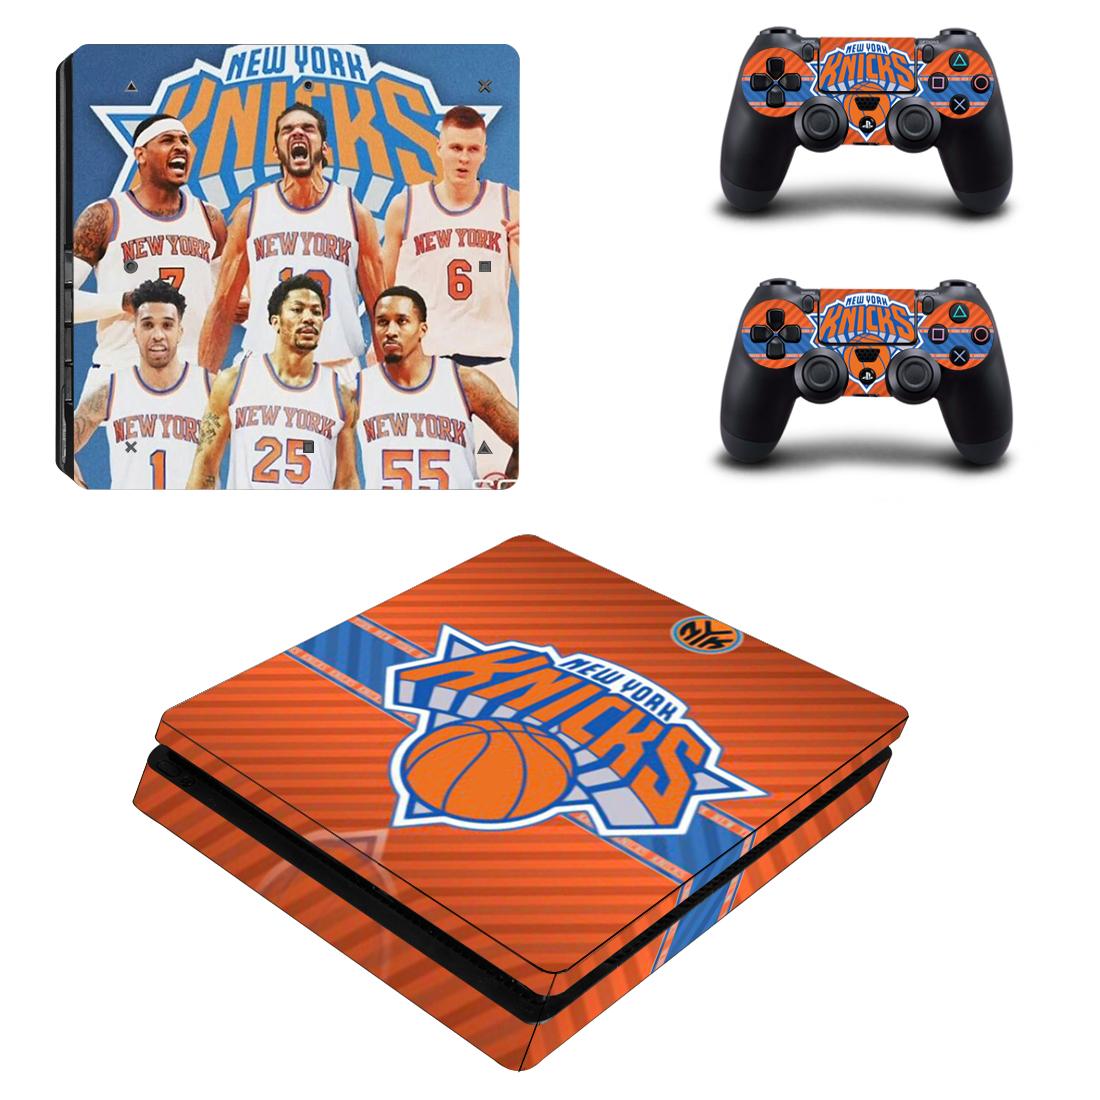 PS4 Slim Polep Skin New York Knicks